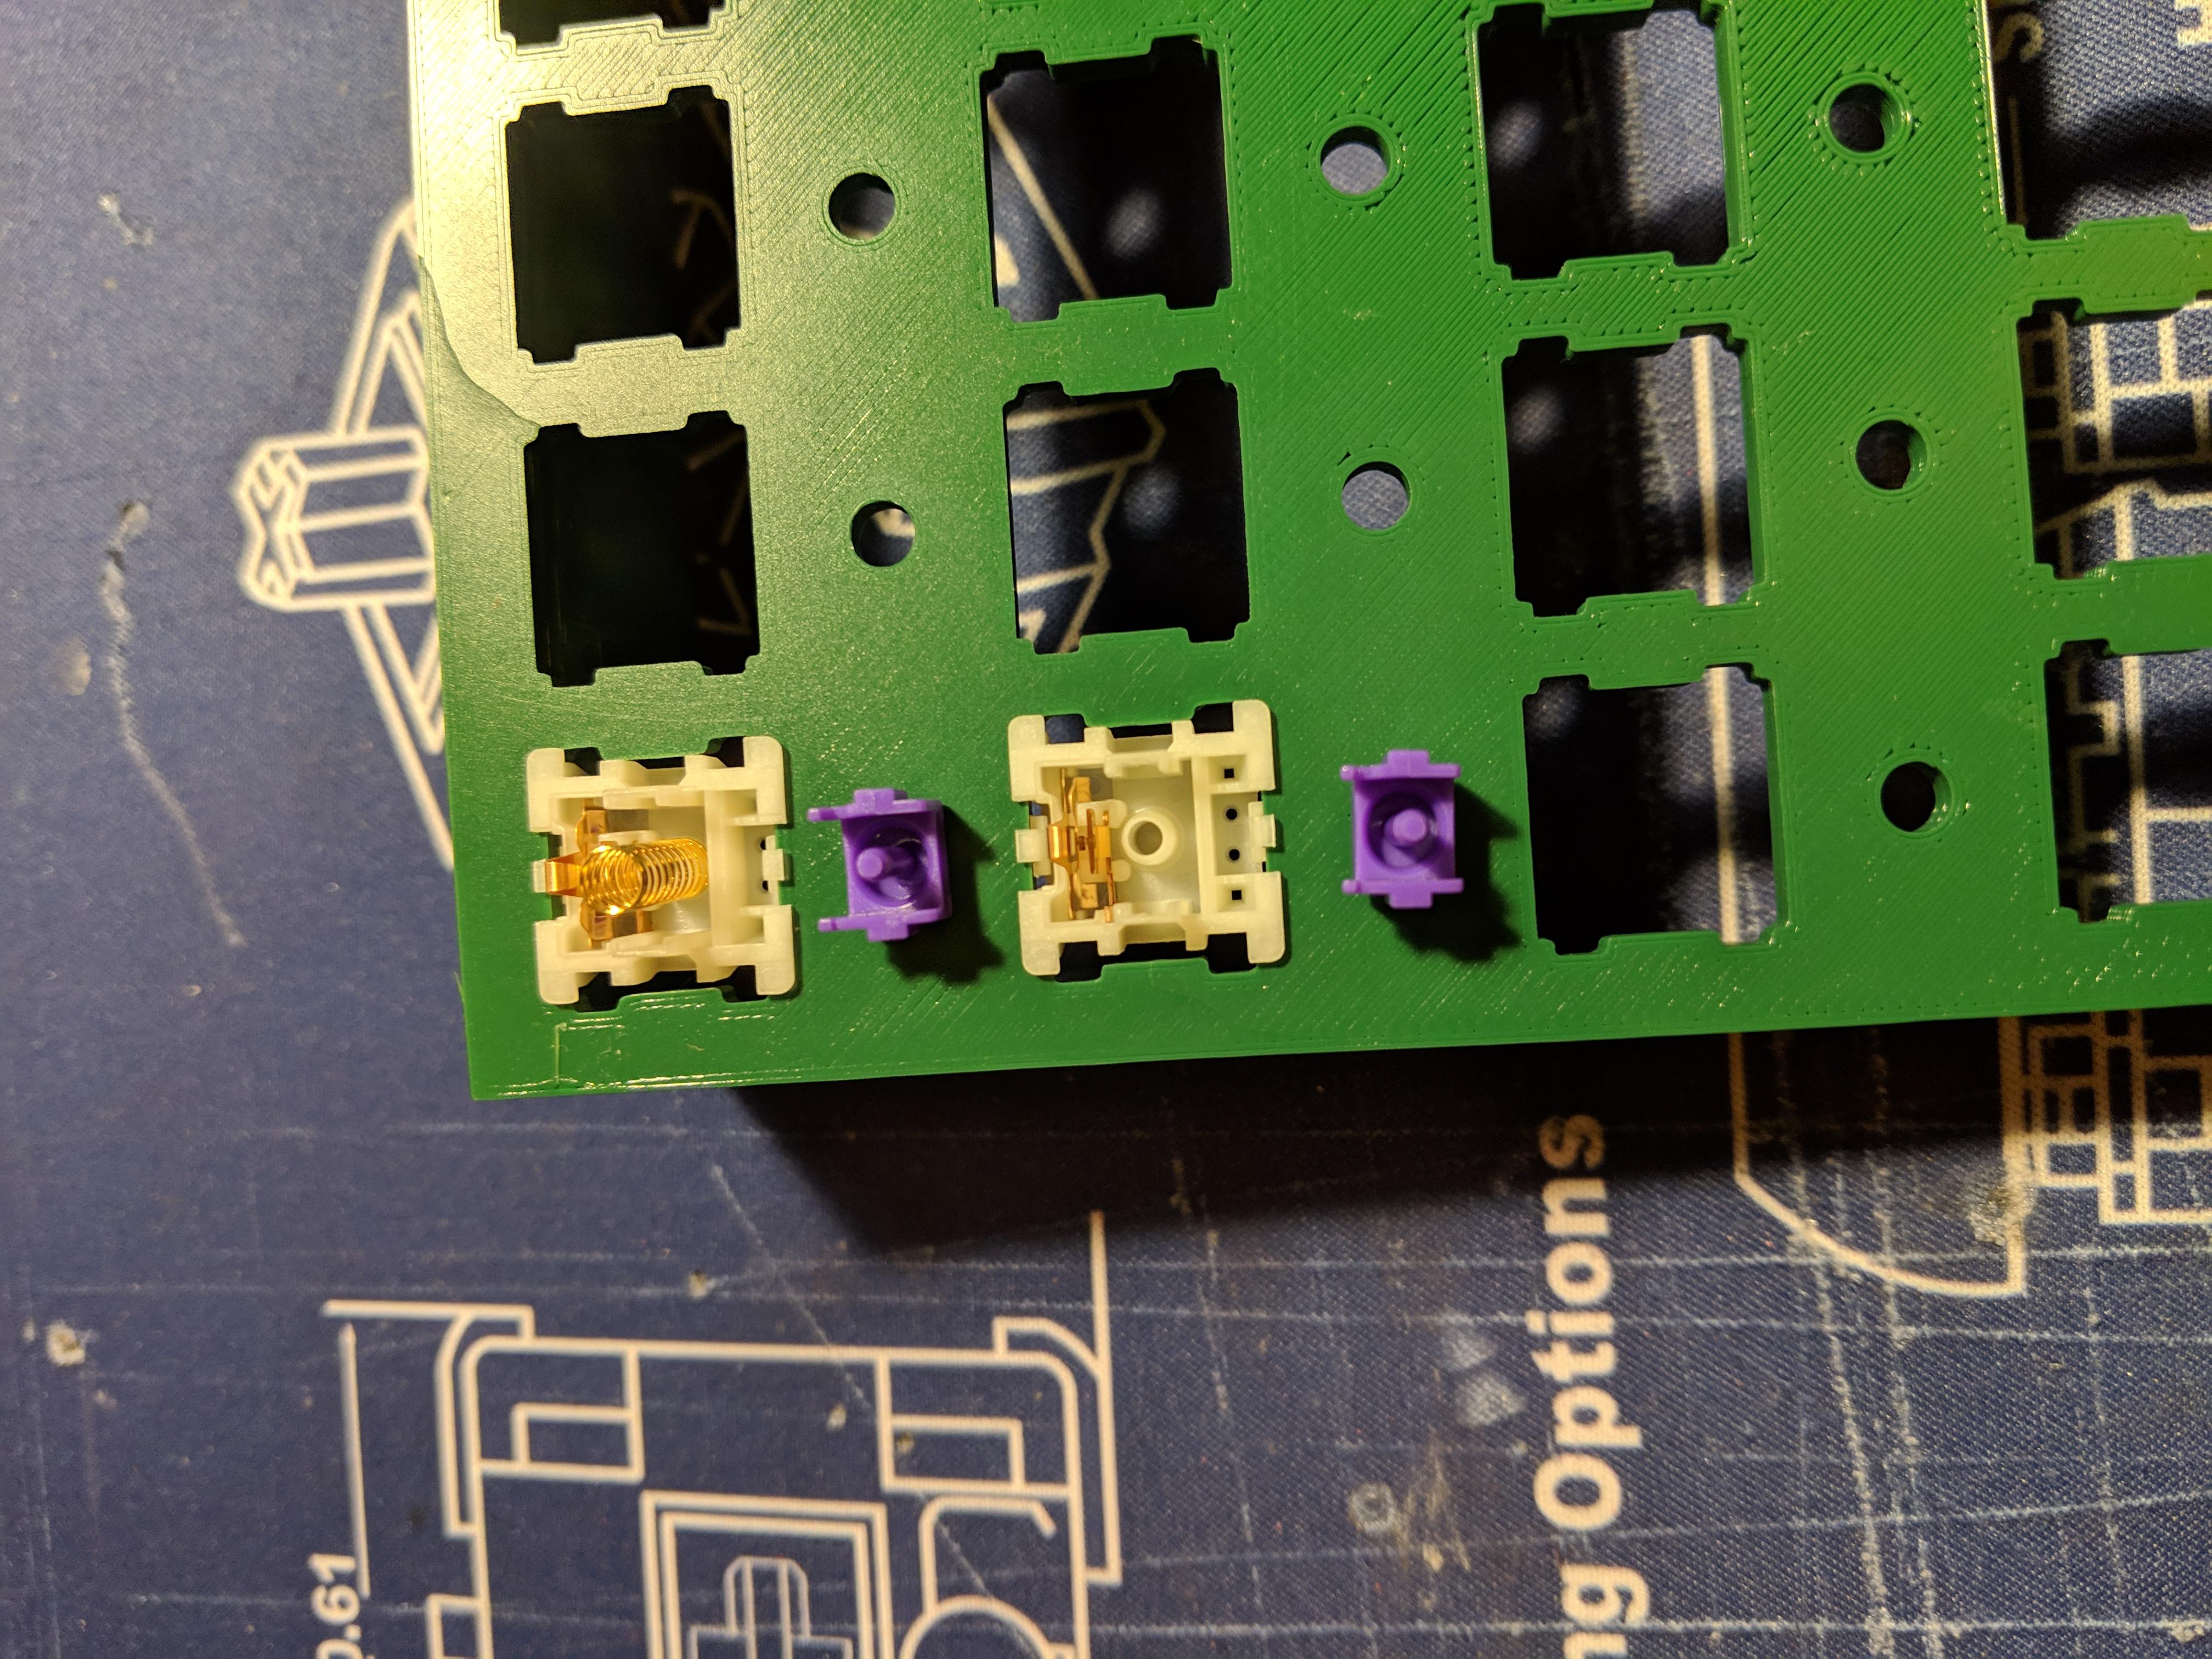 Simple switch lube station - General DIY - KeebTalk